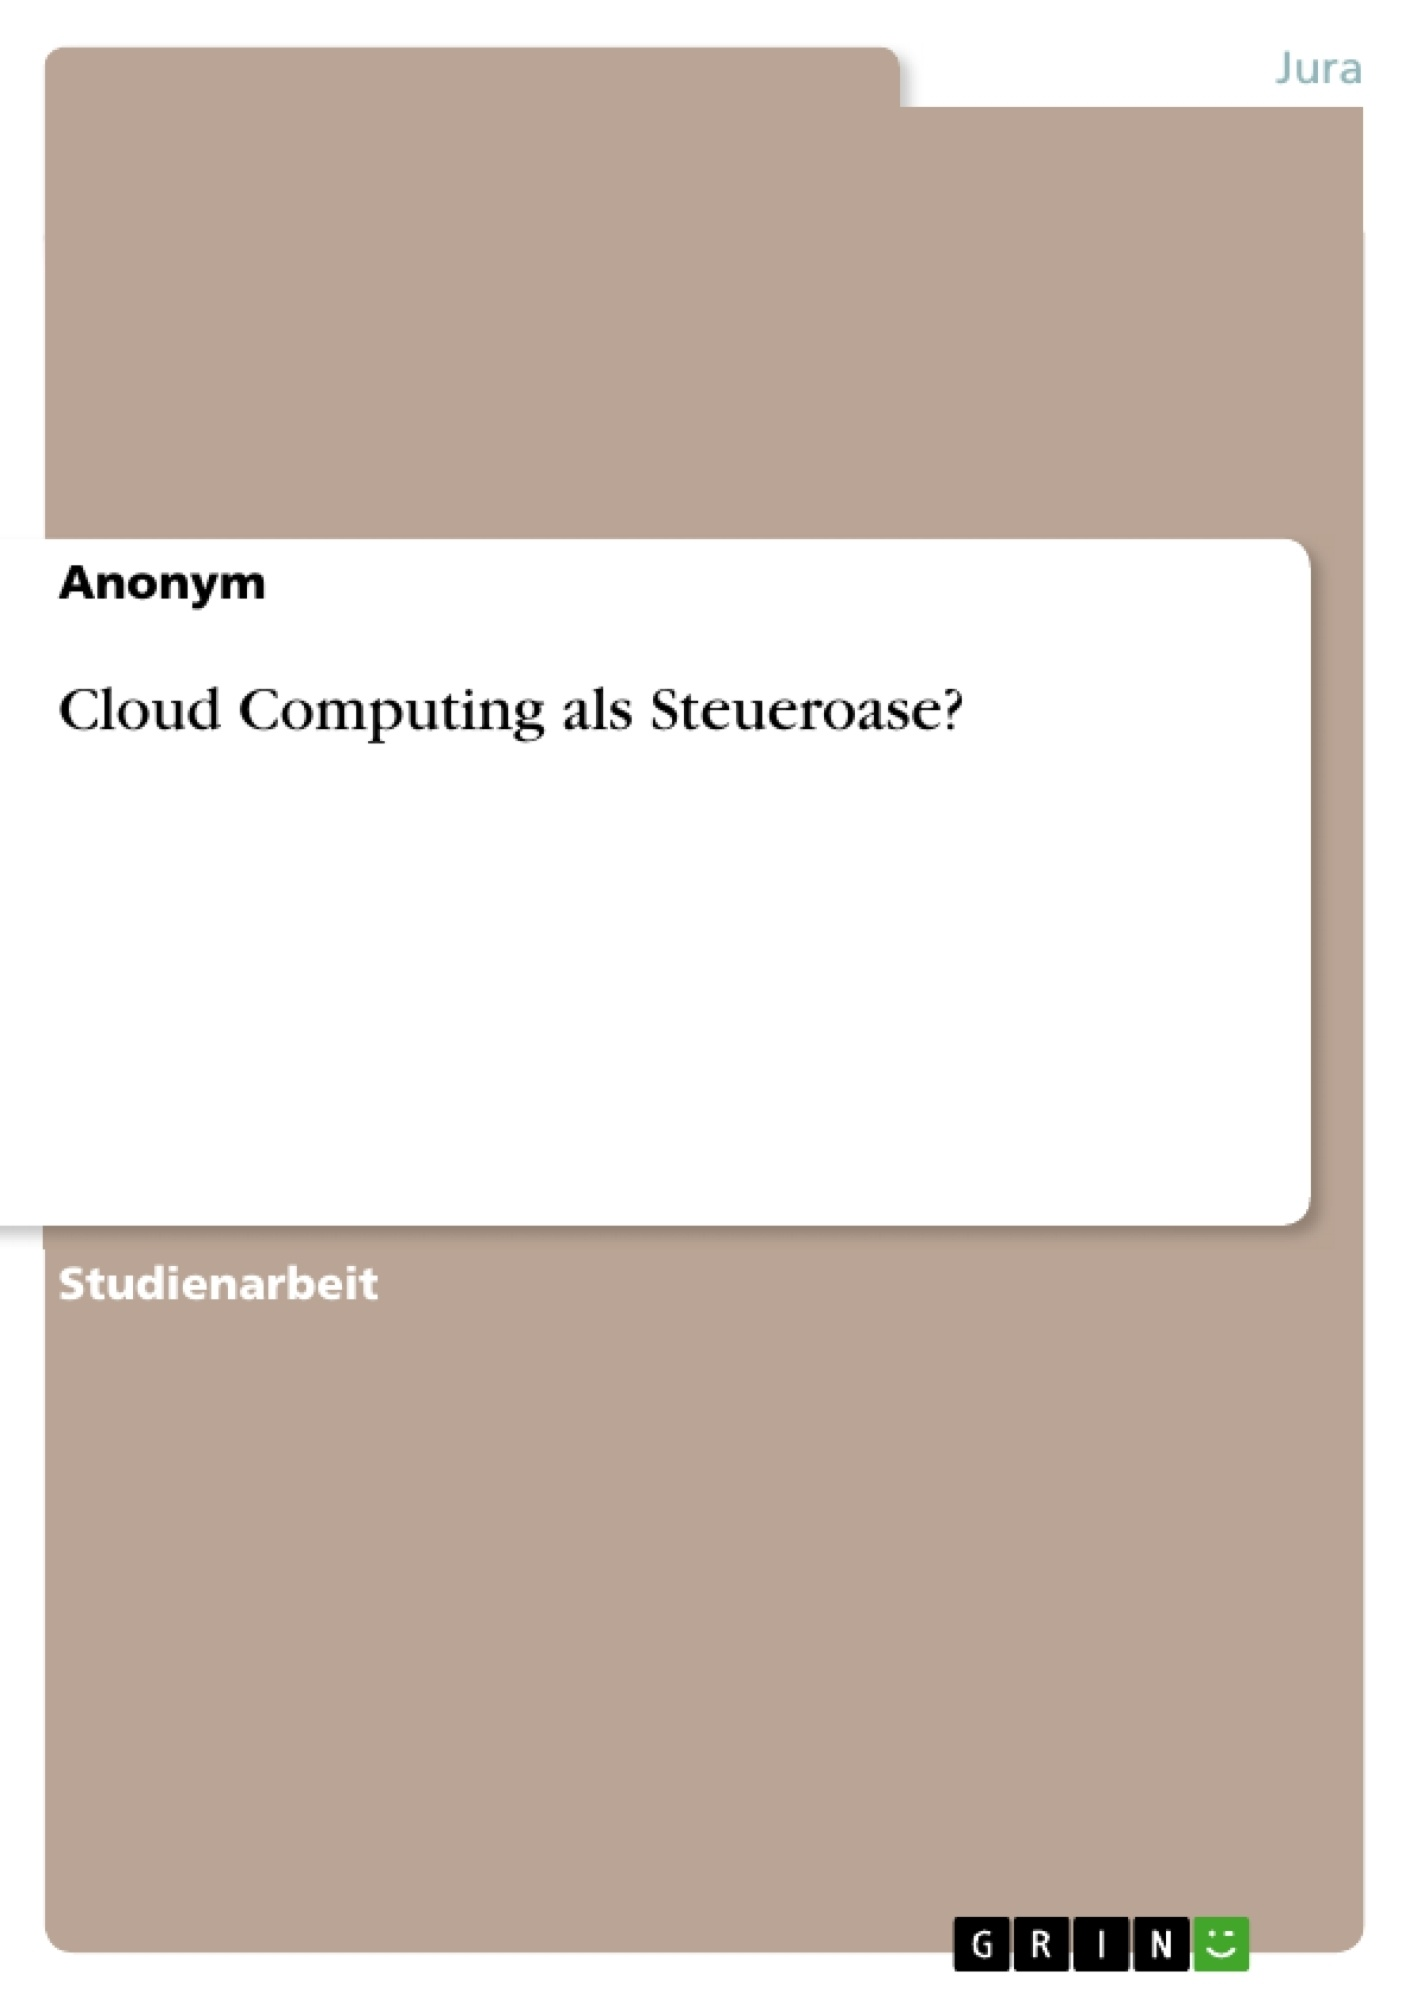 Titel: Cloud Computing als Steueroase?